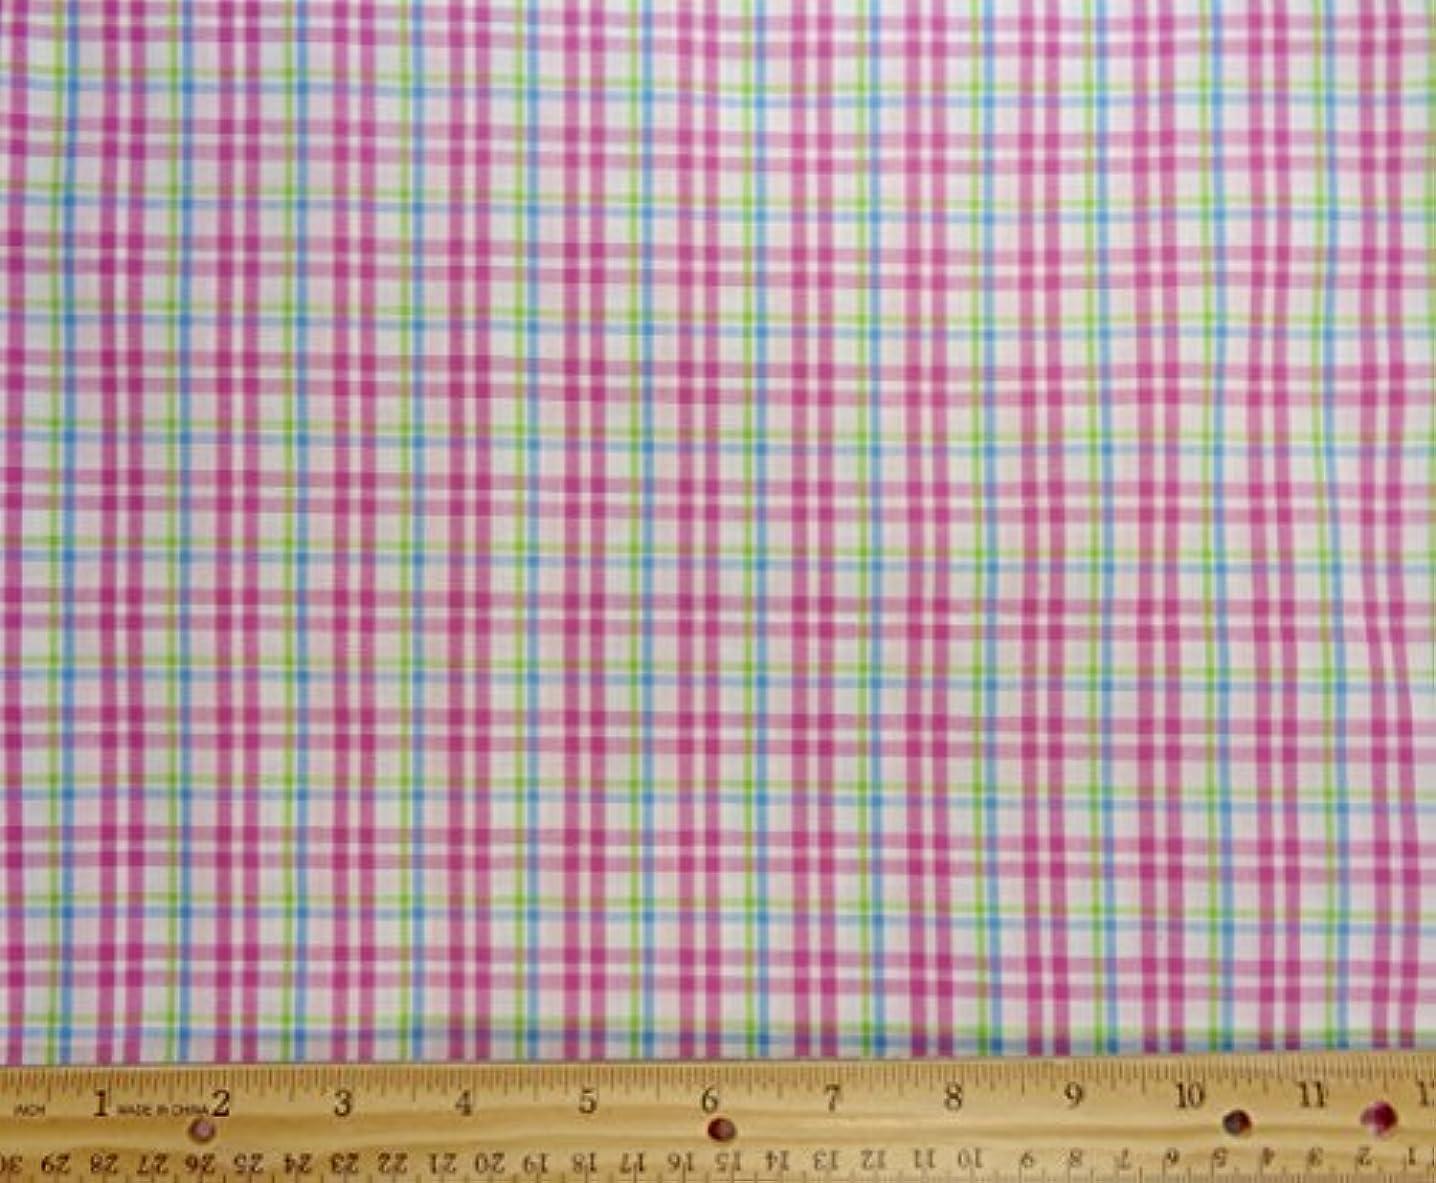 Summerville Plaid Pink Green Teal Cotton Fabric, 56